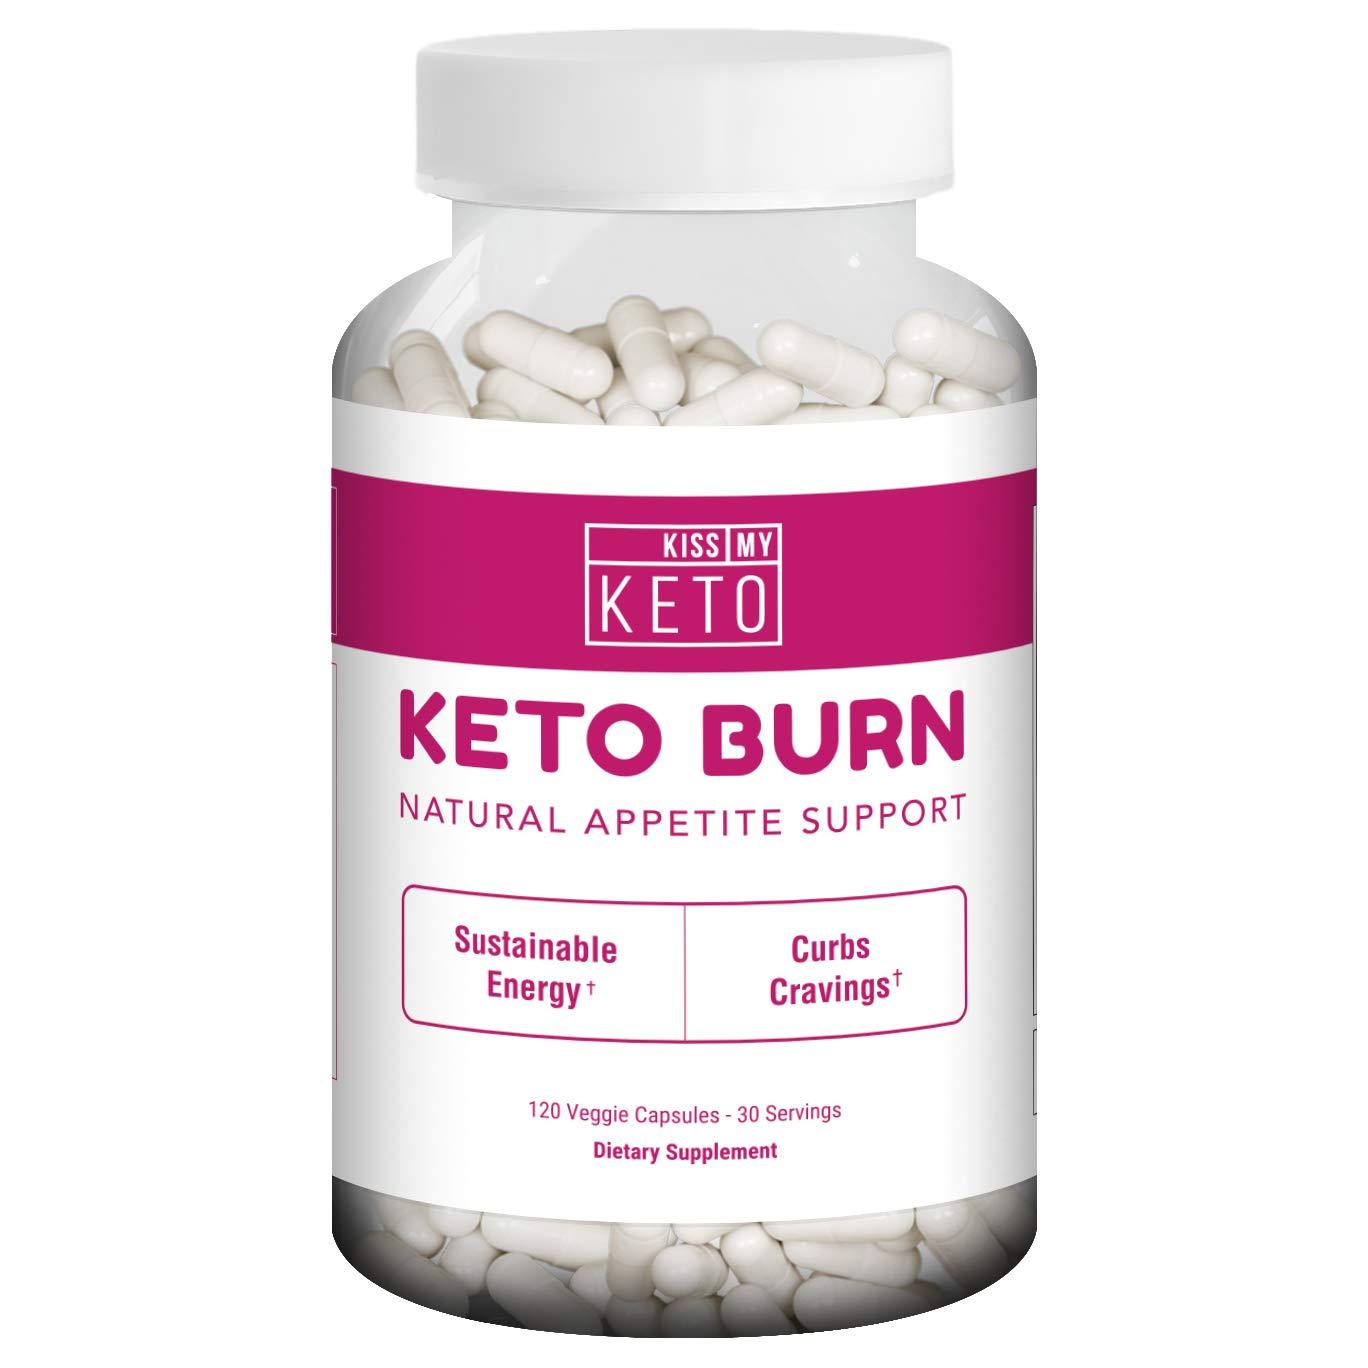 Kiss My Keto Burn Capsules - 120 Vegetable Capsules for Natural Appetite Support, L Carnitine, Garcinia Cambogia, Apple Cider Vinegar, CLA, Coleus Forskohlii